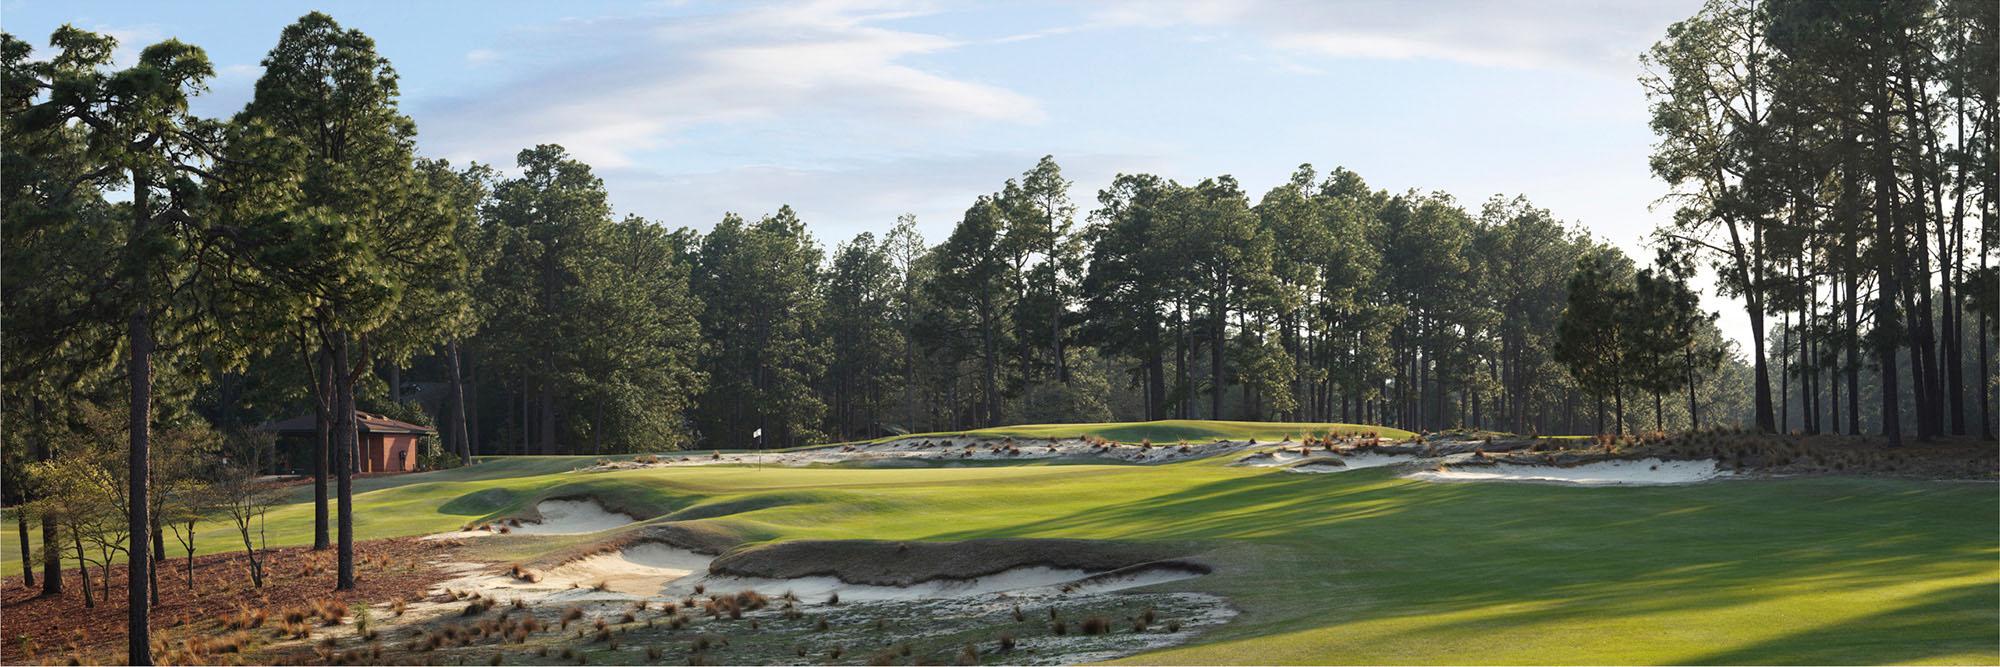 Pinehurst Course 2